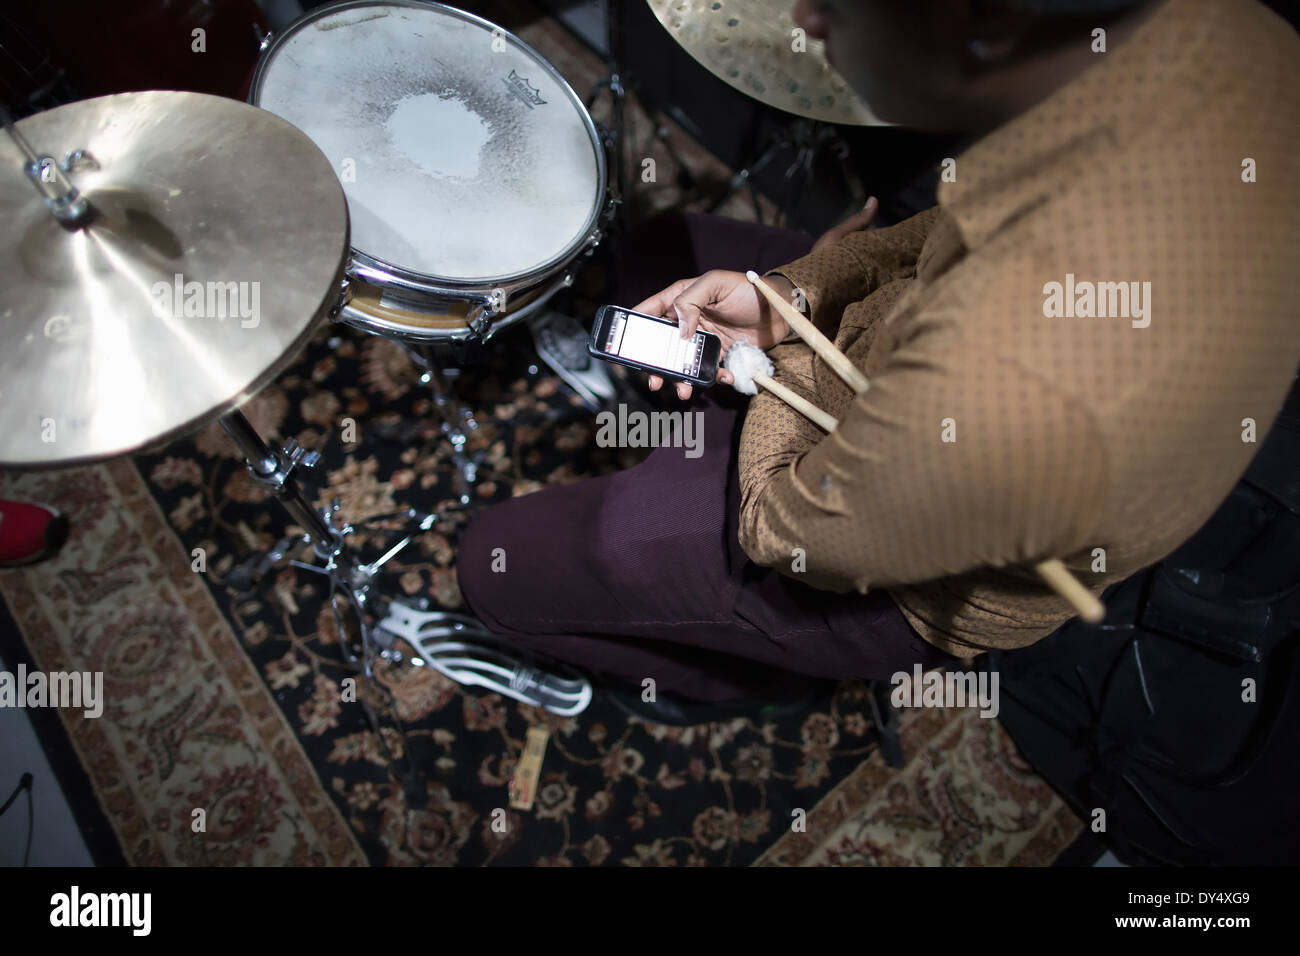 Drummer sitting at drum kit, using smart phone - Stock Image